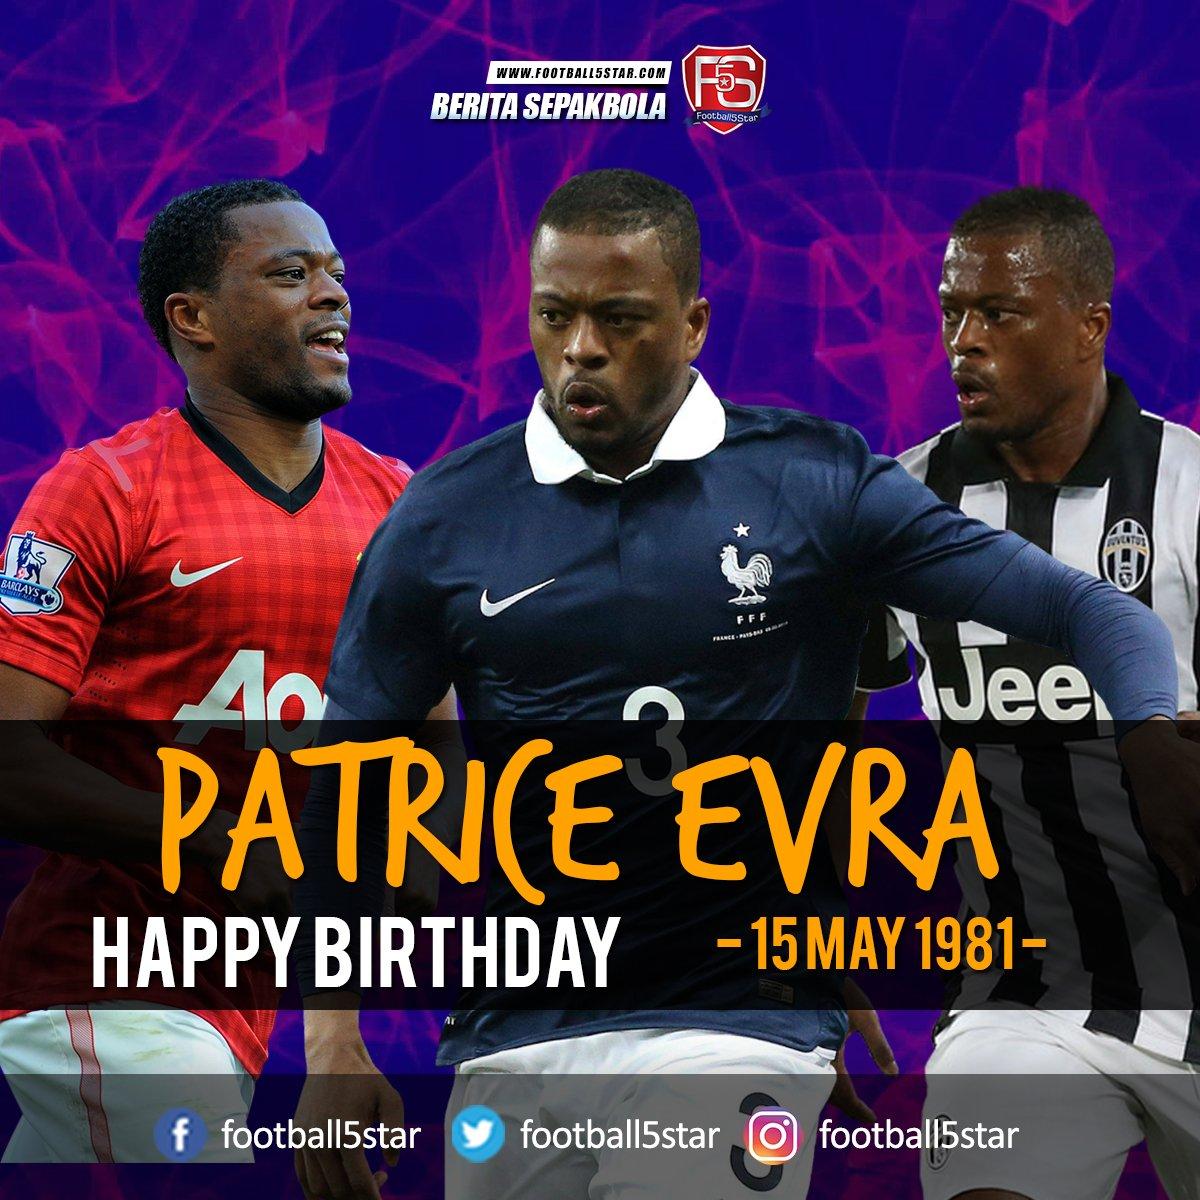 Happy Birthday Patrice Evra 15 May 1981